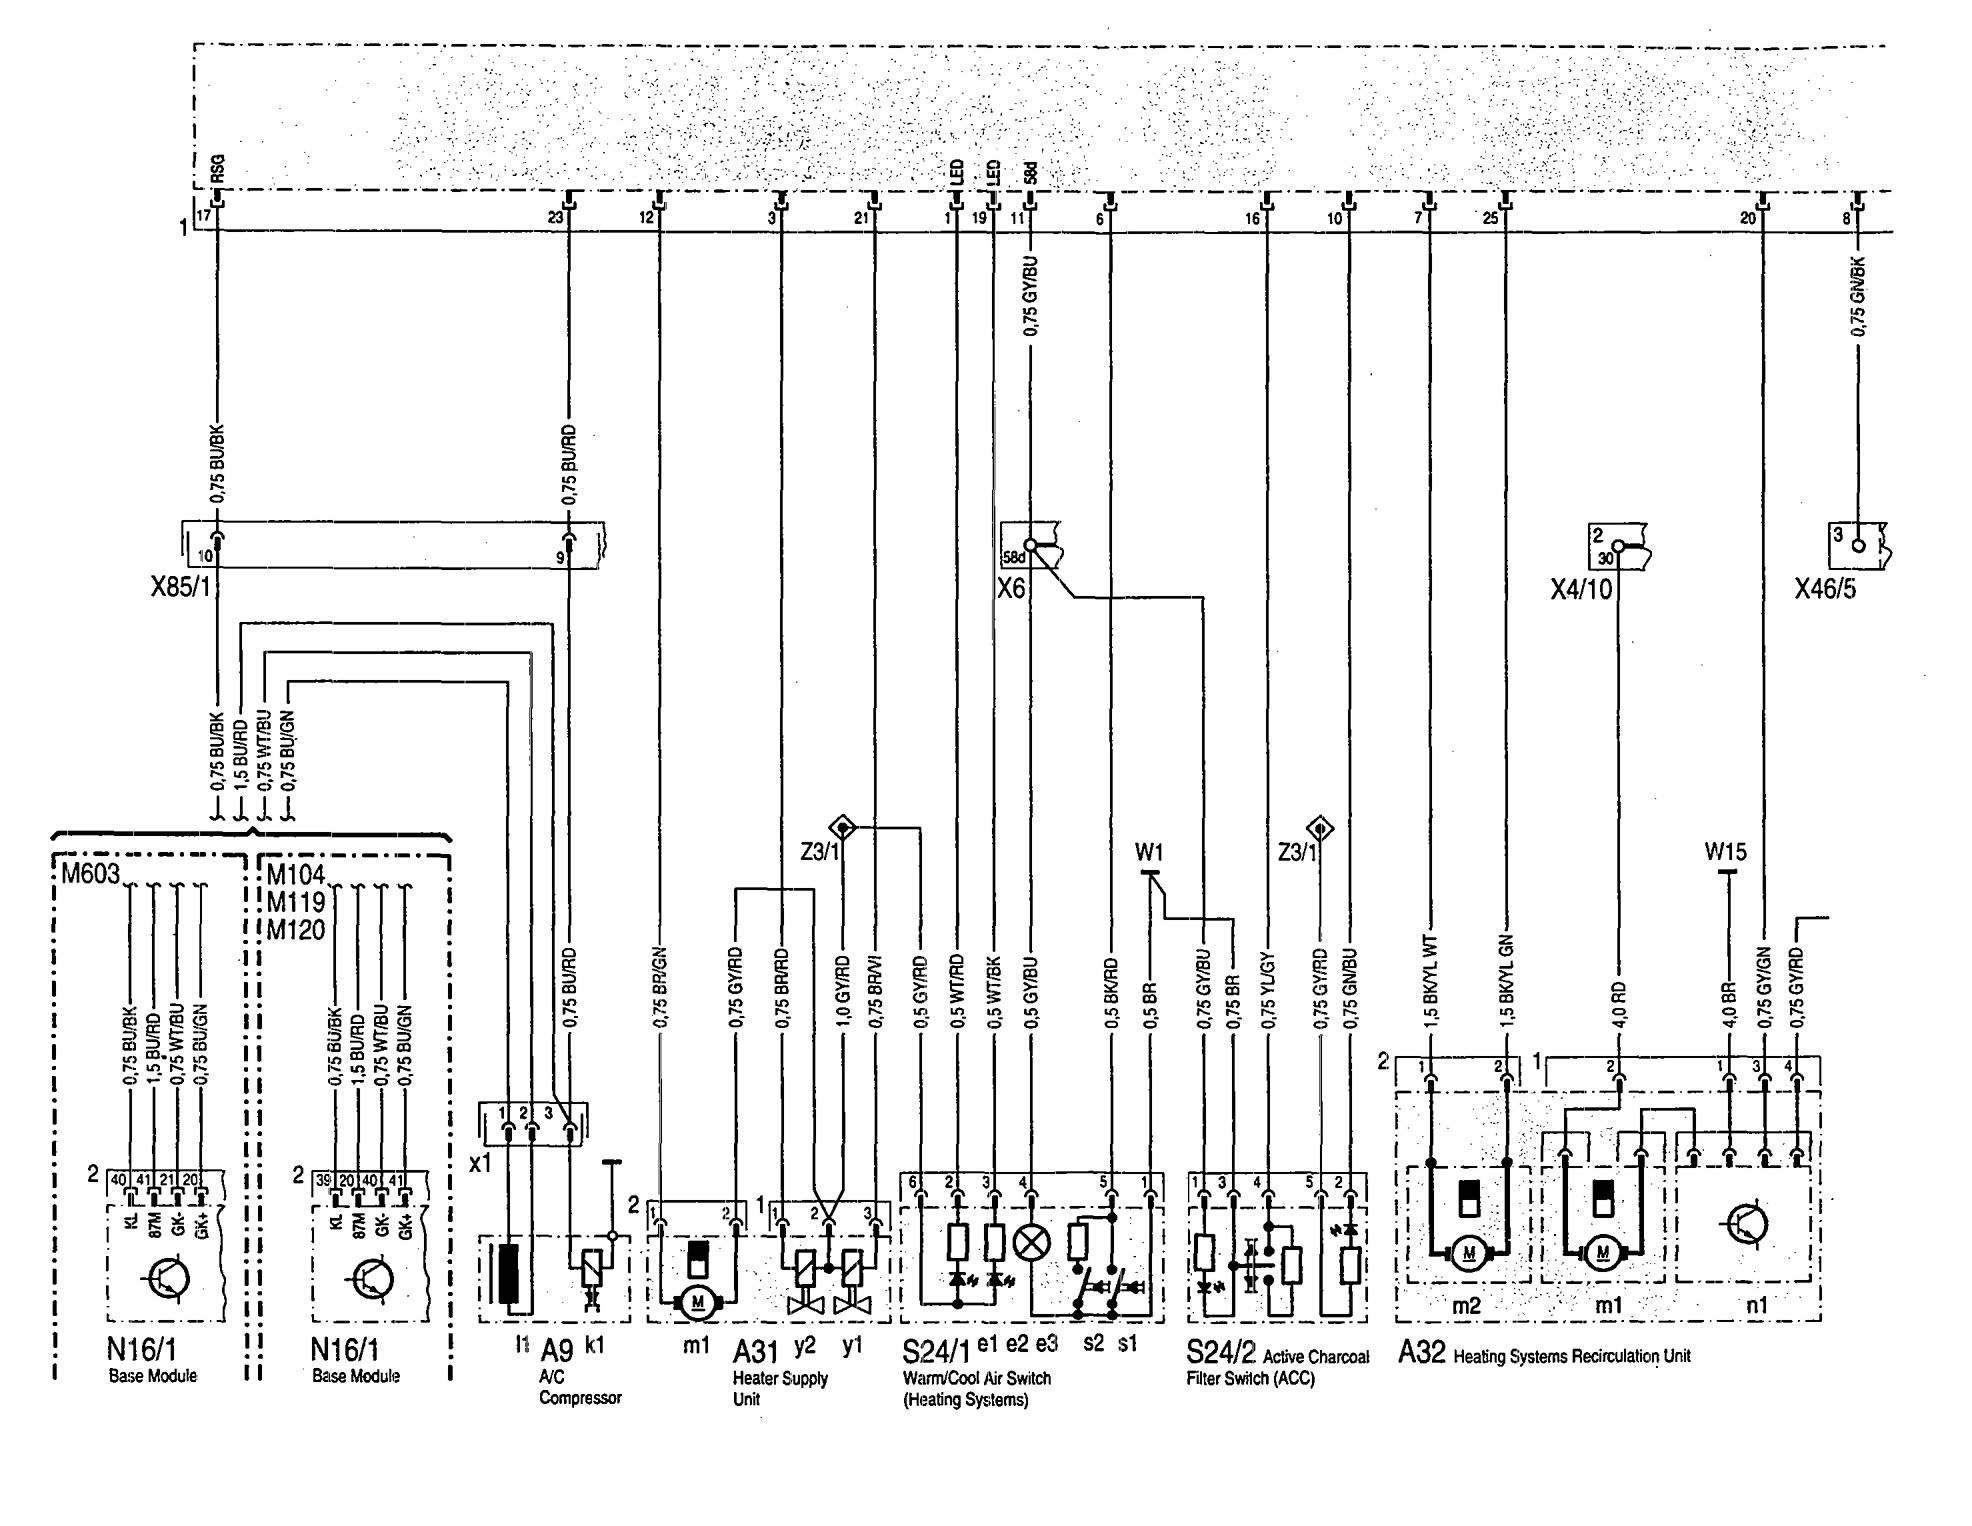 [DIAGRAM_1CA]  Mercedes-Benz 300SE (1992 - 1993) - wiring diagram - HVAC Controls -  Carknowledge.info   1992 Mercedes 300se Fuse Diagram      Carknowledge.info